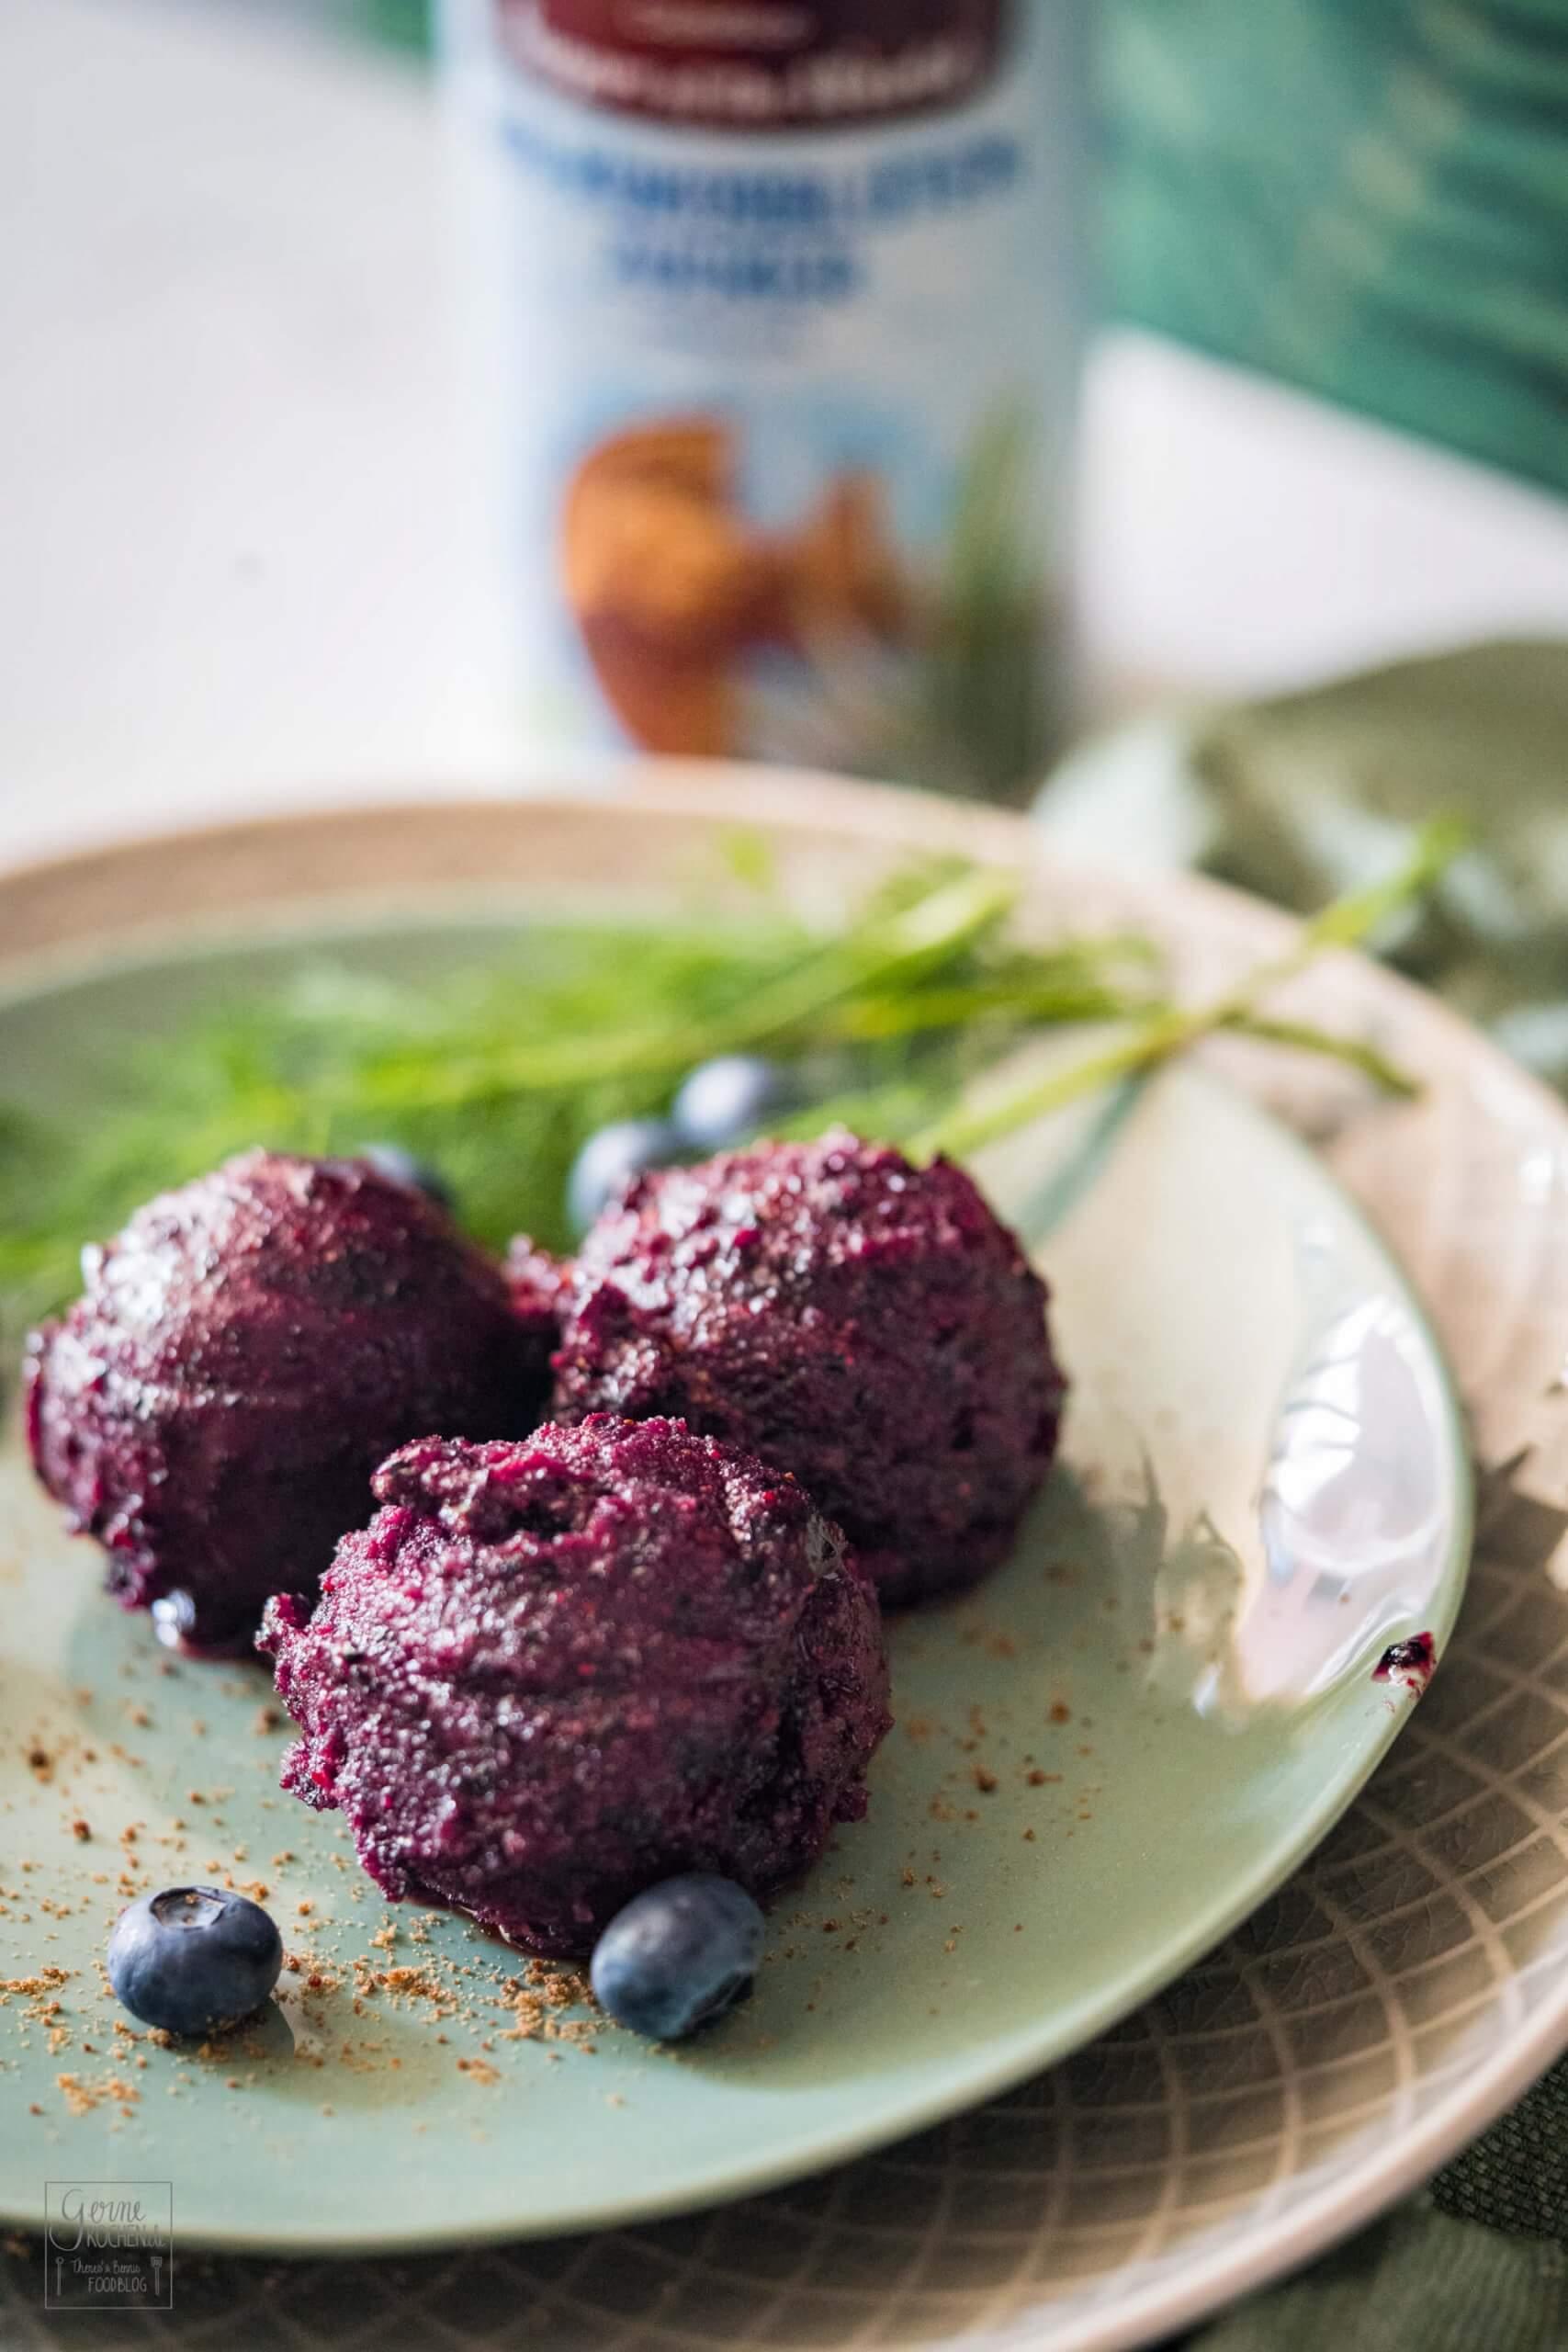 Blaubeer-Sorbet mit Kokosblütenzucker und Dill